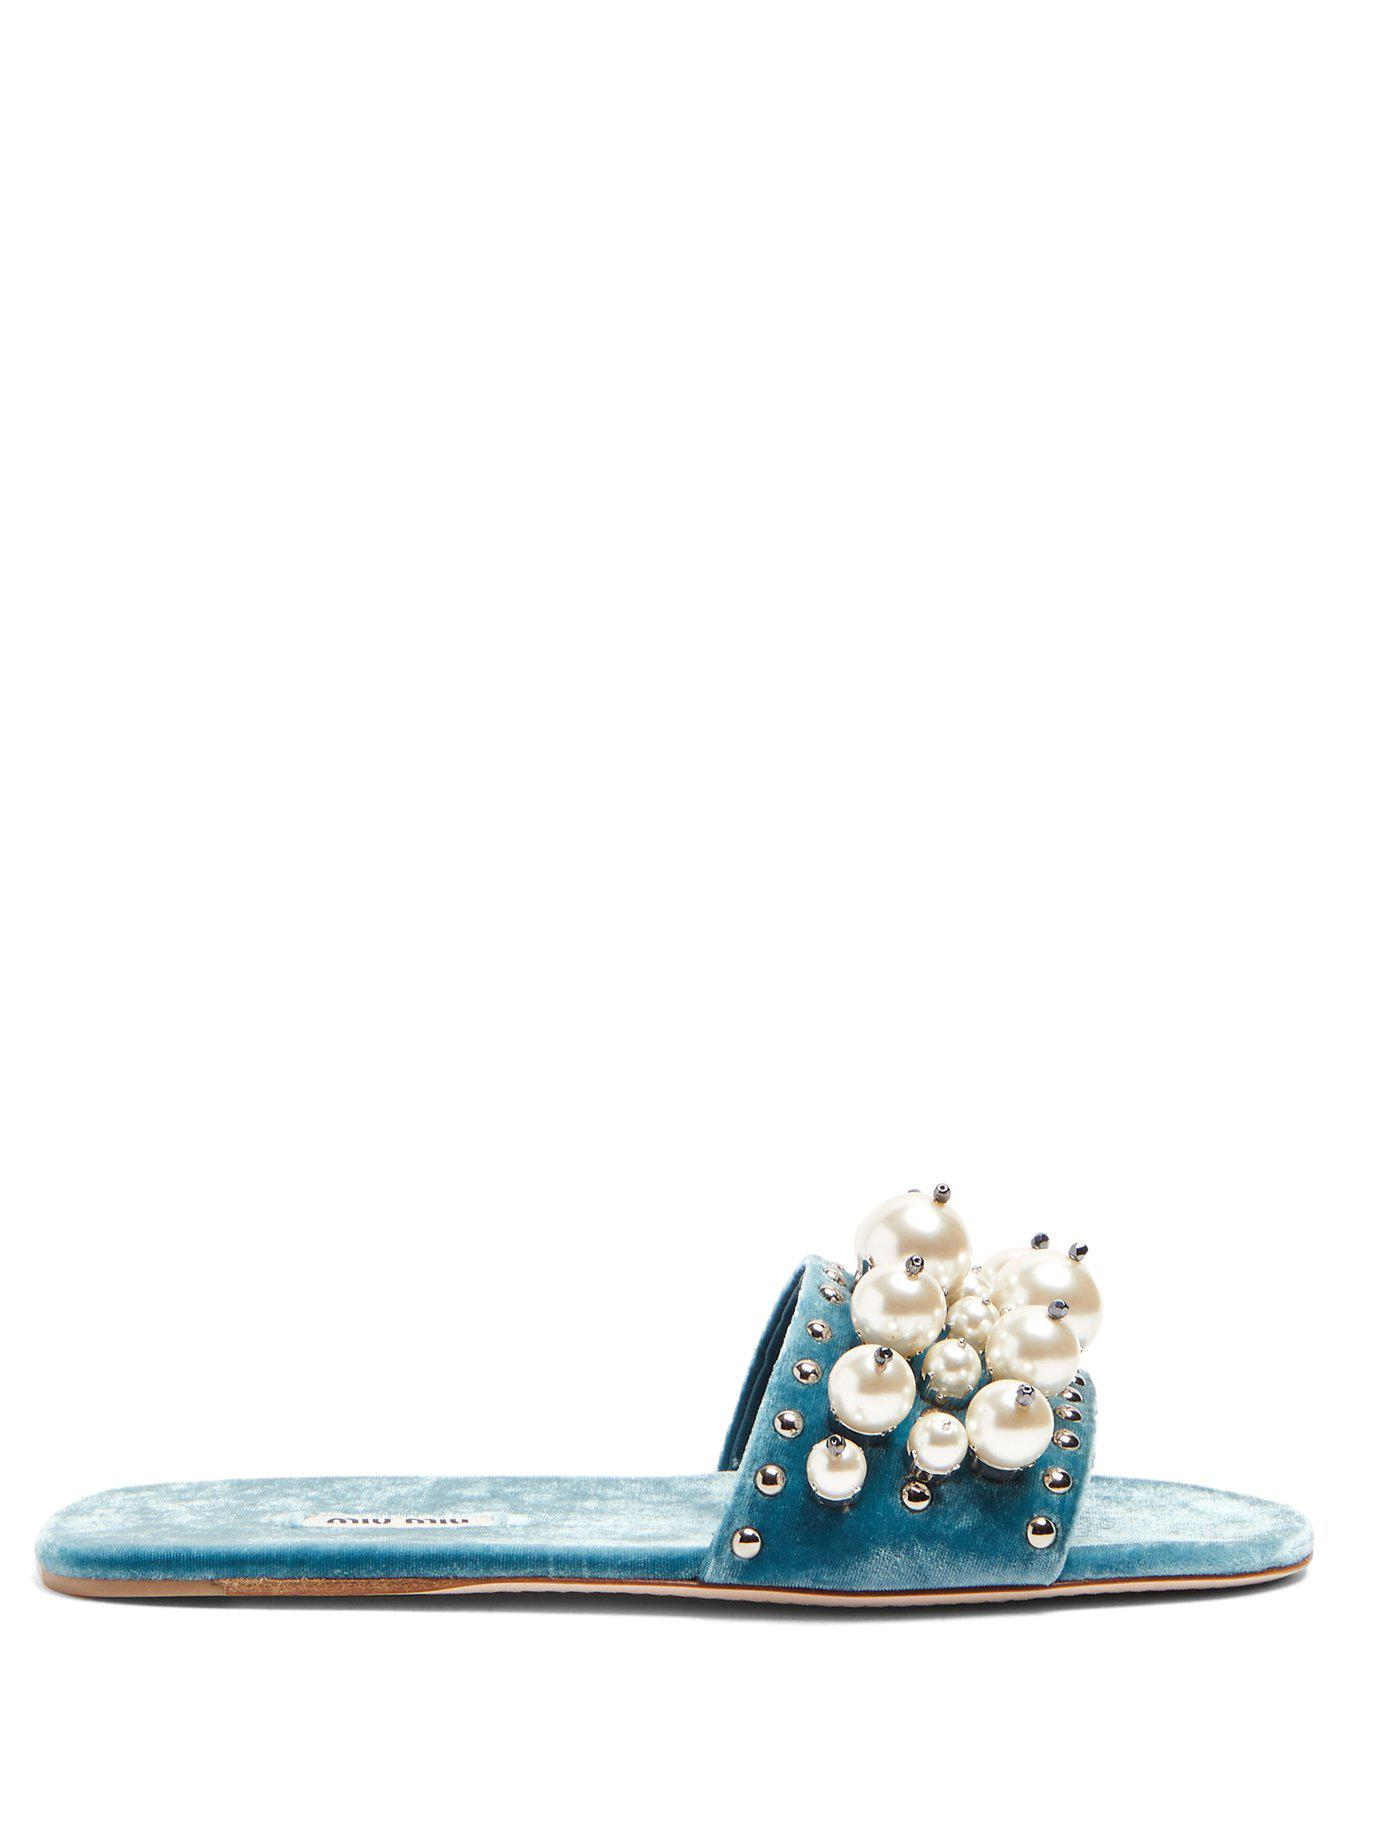 809674d08367 Lyst - Miu Miu Faux Pearl Embellished Velvet Slides in Blue - Save 67%